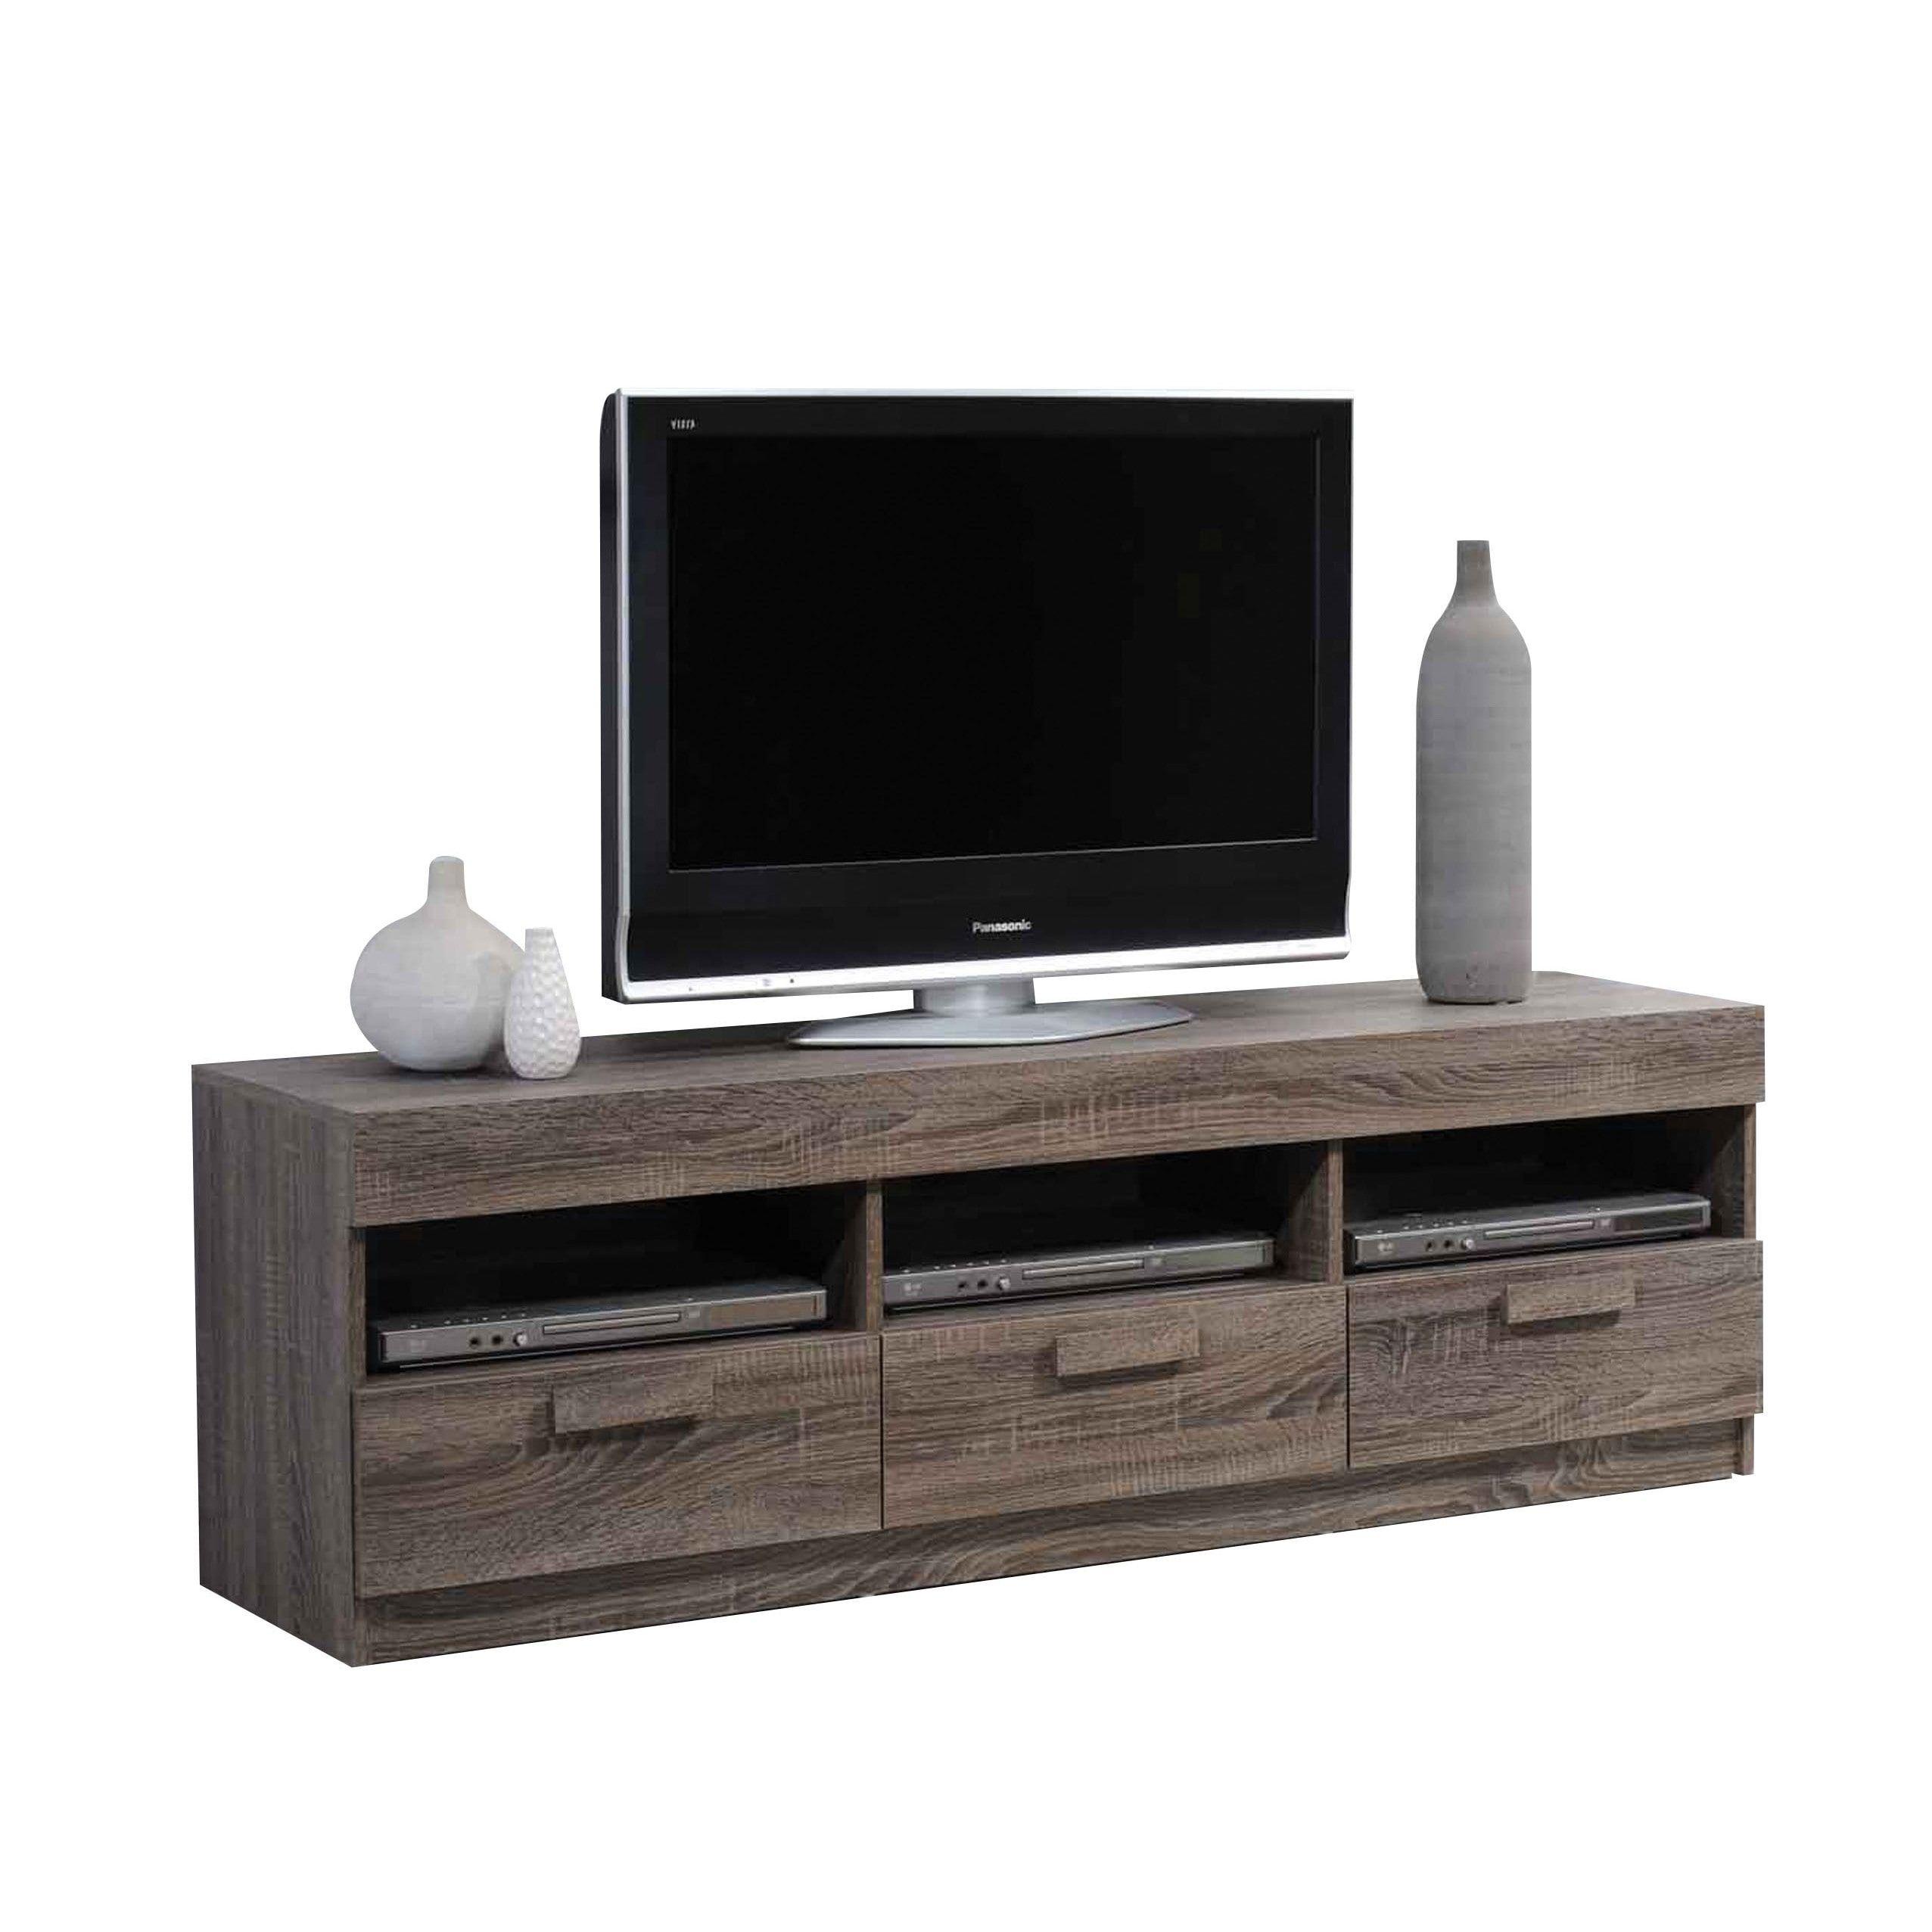 Acme Furniture Alvin Rustic Oak TV Stand   Overstock com Shopping   The  Best Deals. Acme Furniture Alvin Rustic Oak TV Stand   Overstock com Shopping